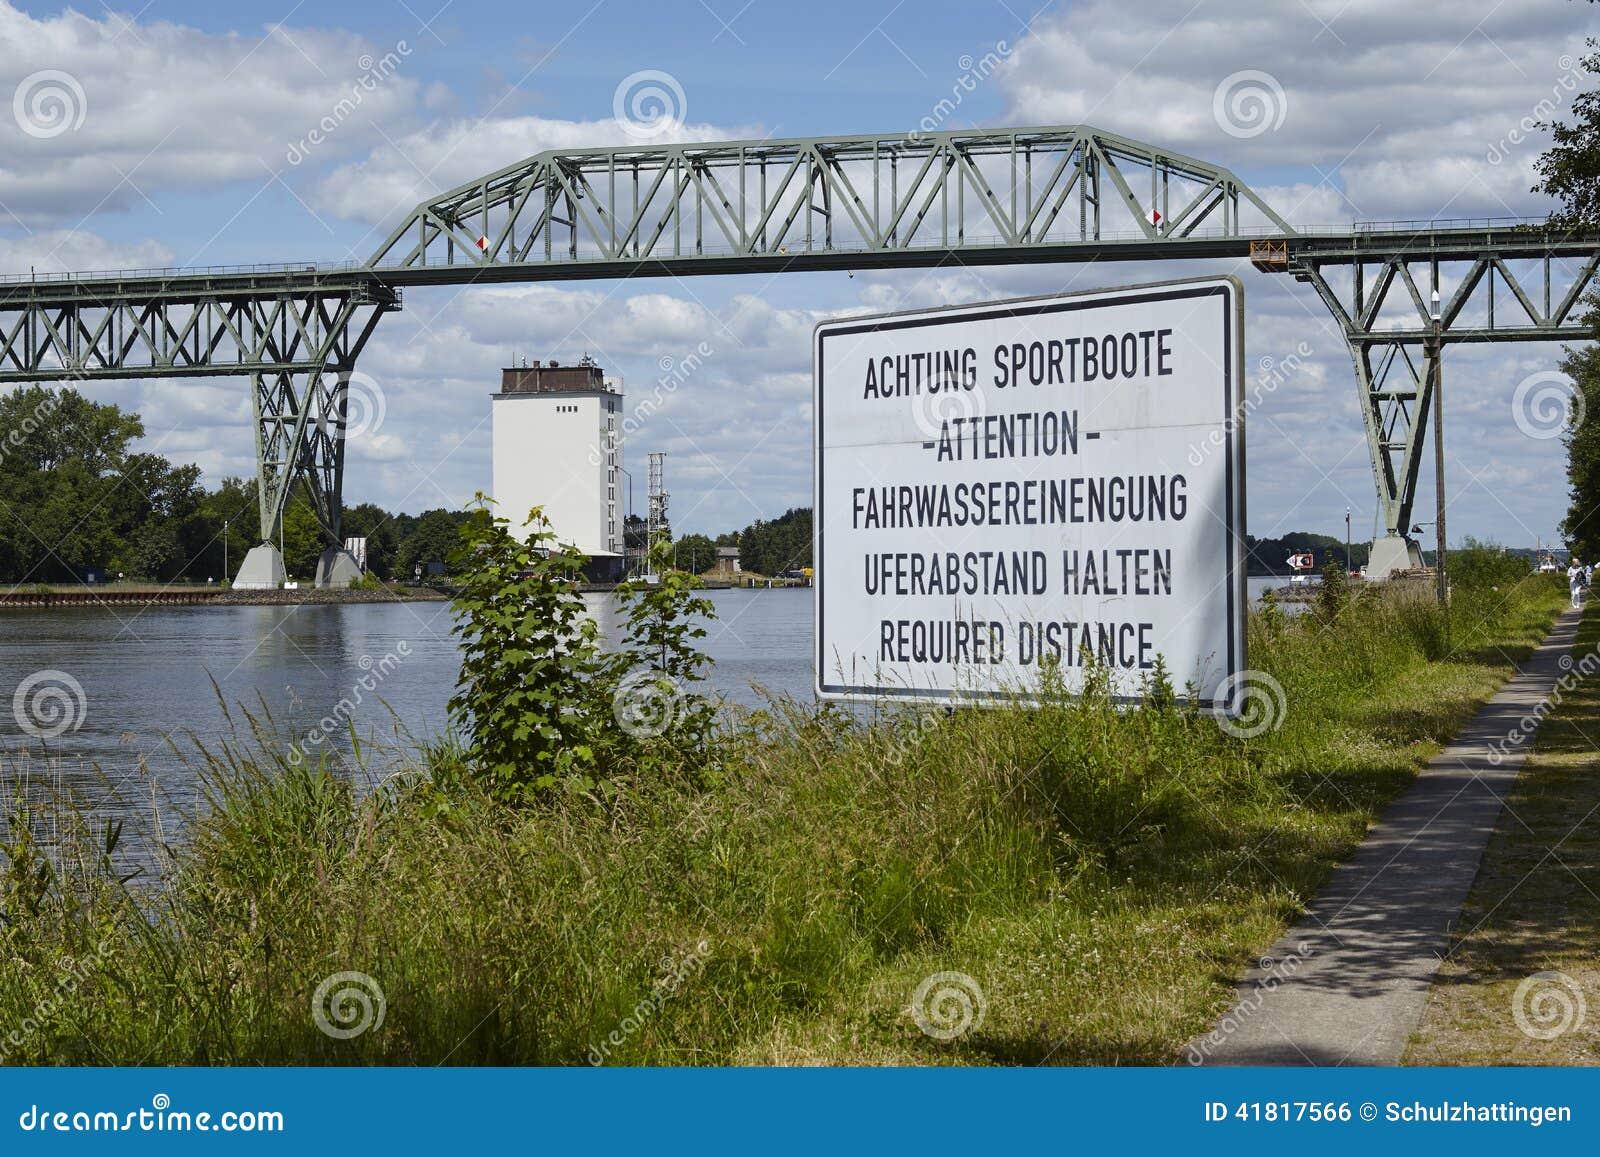 Hochdonn - Railway bridge over the Kiel Canal